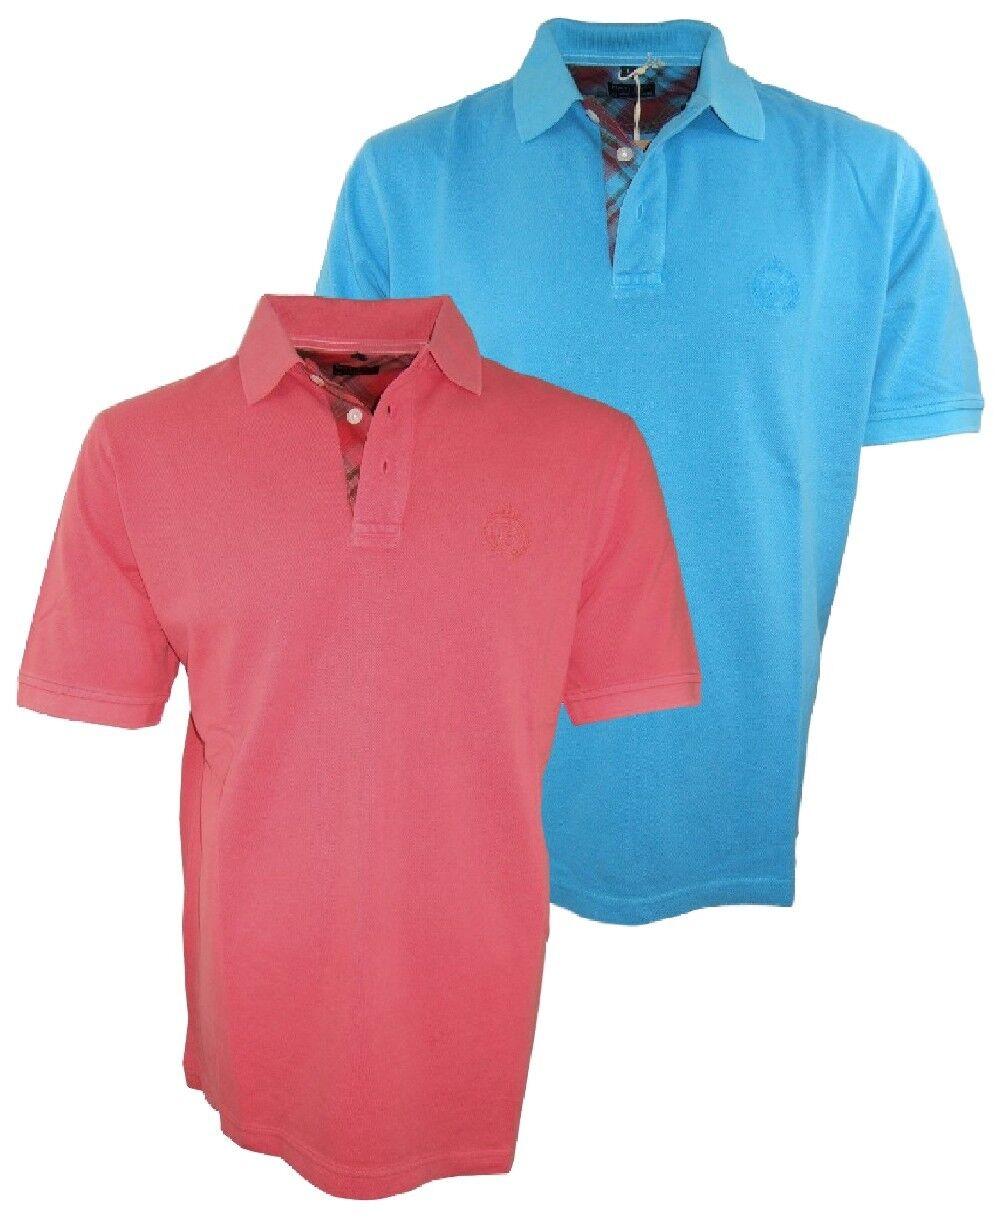 ANGEBOT Baileys Polo Shirt Piqué TREND in beere oder aquablue Gr. XL bis 4XL